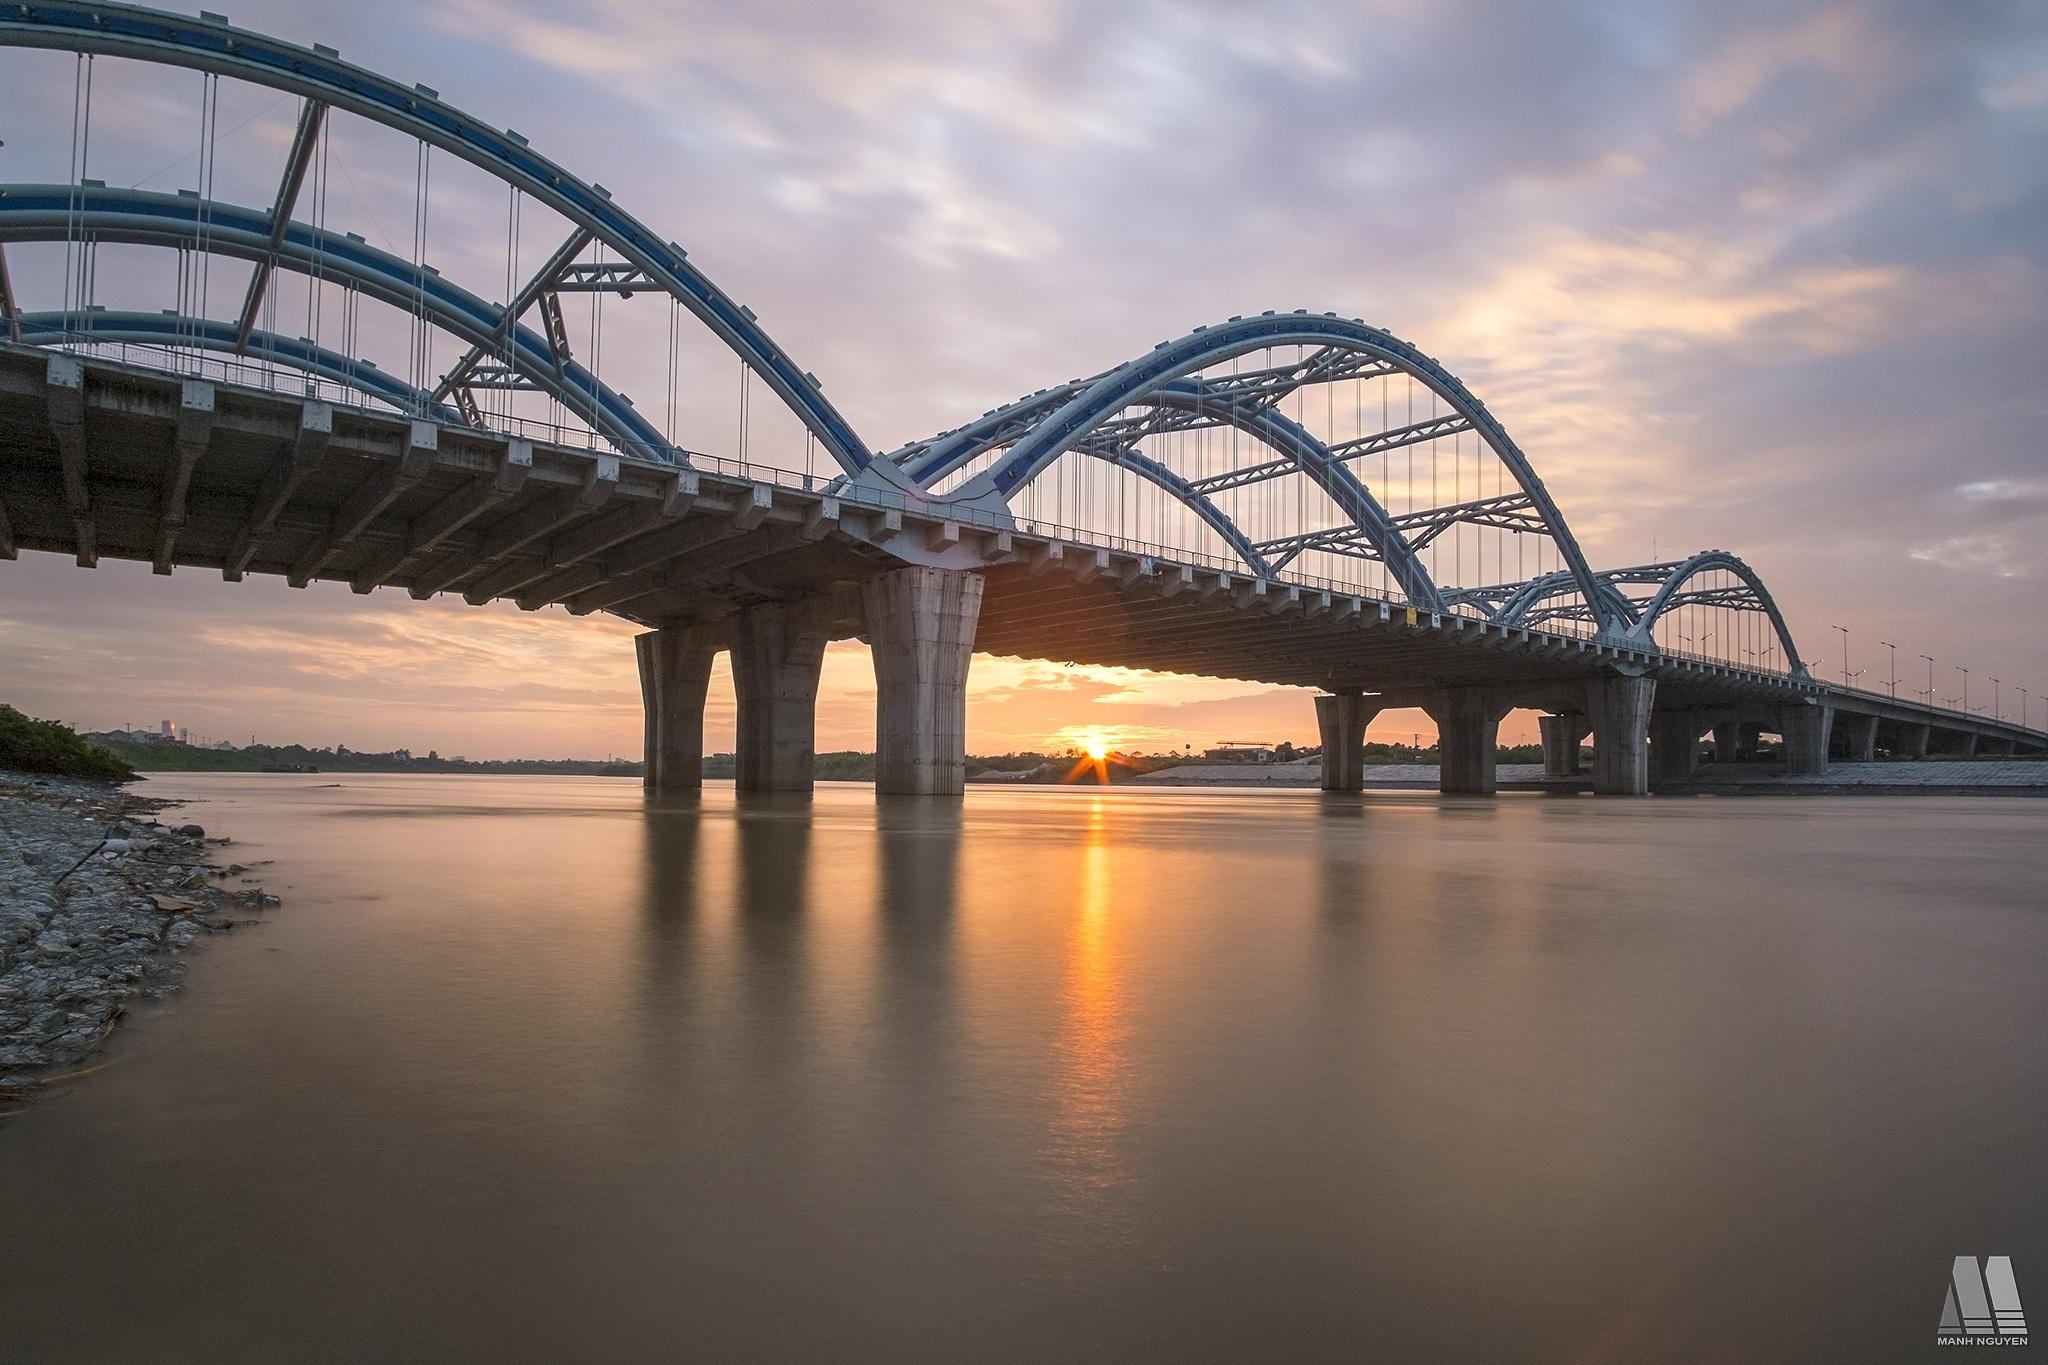 Dong Tru bridge by Manhck